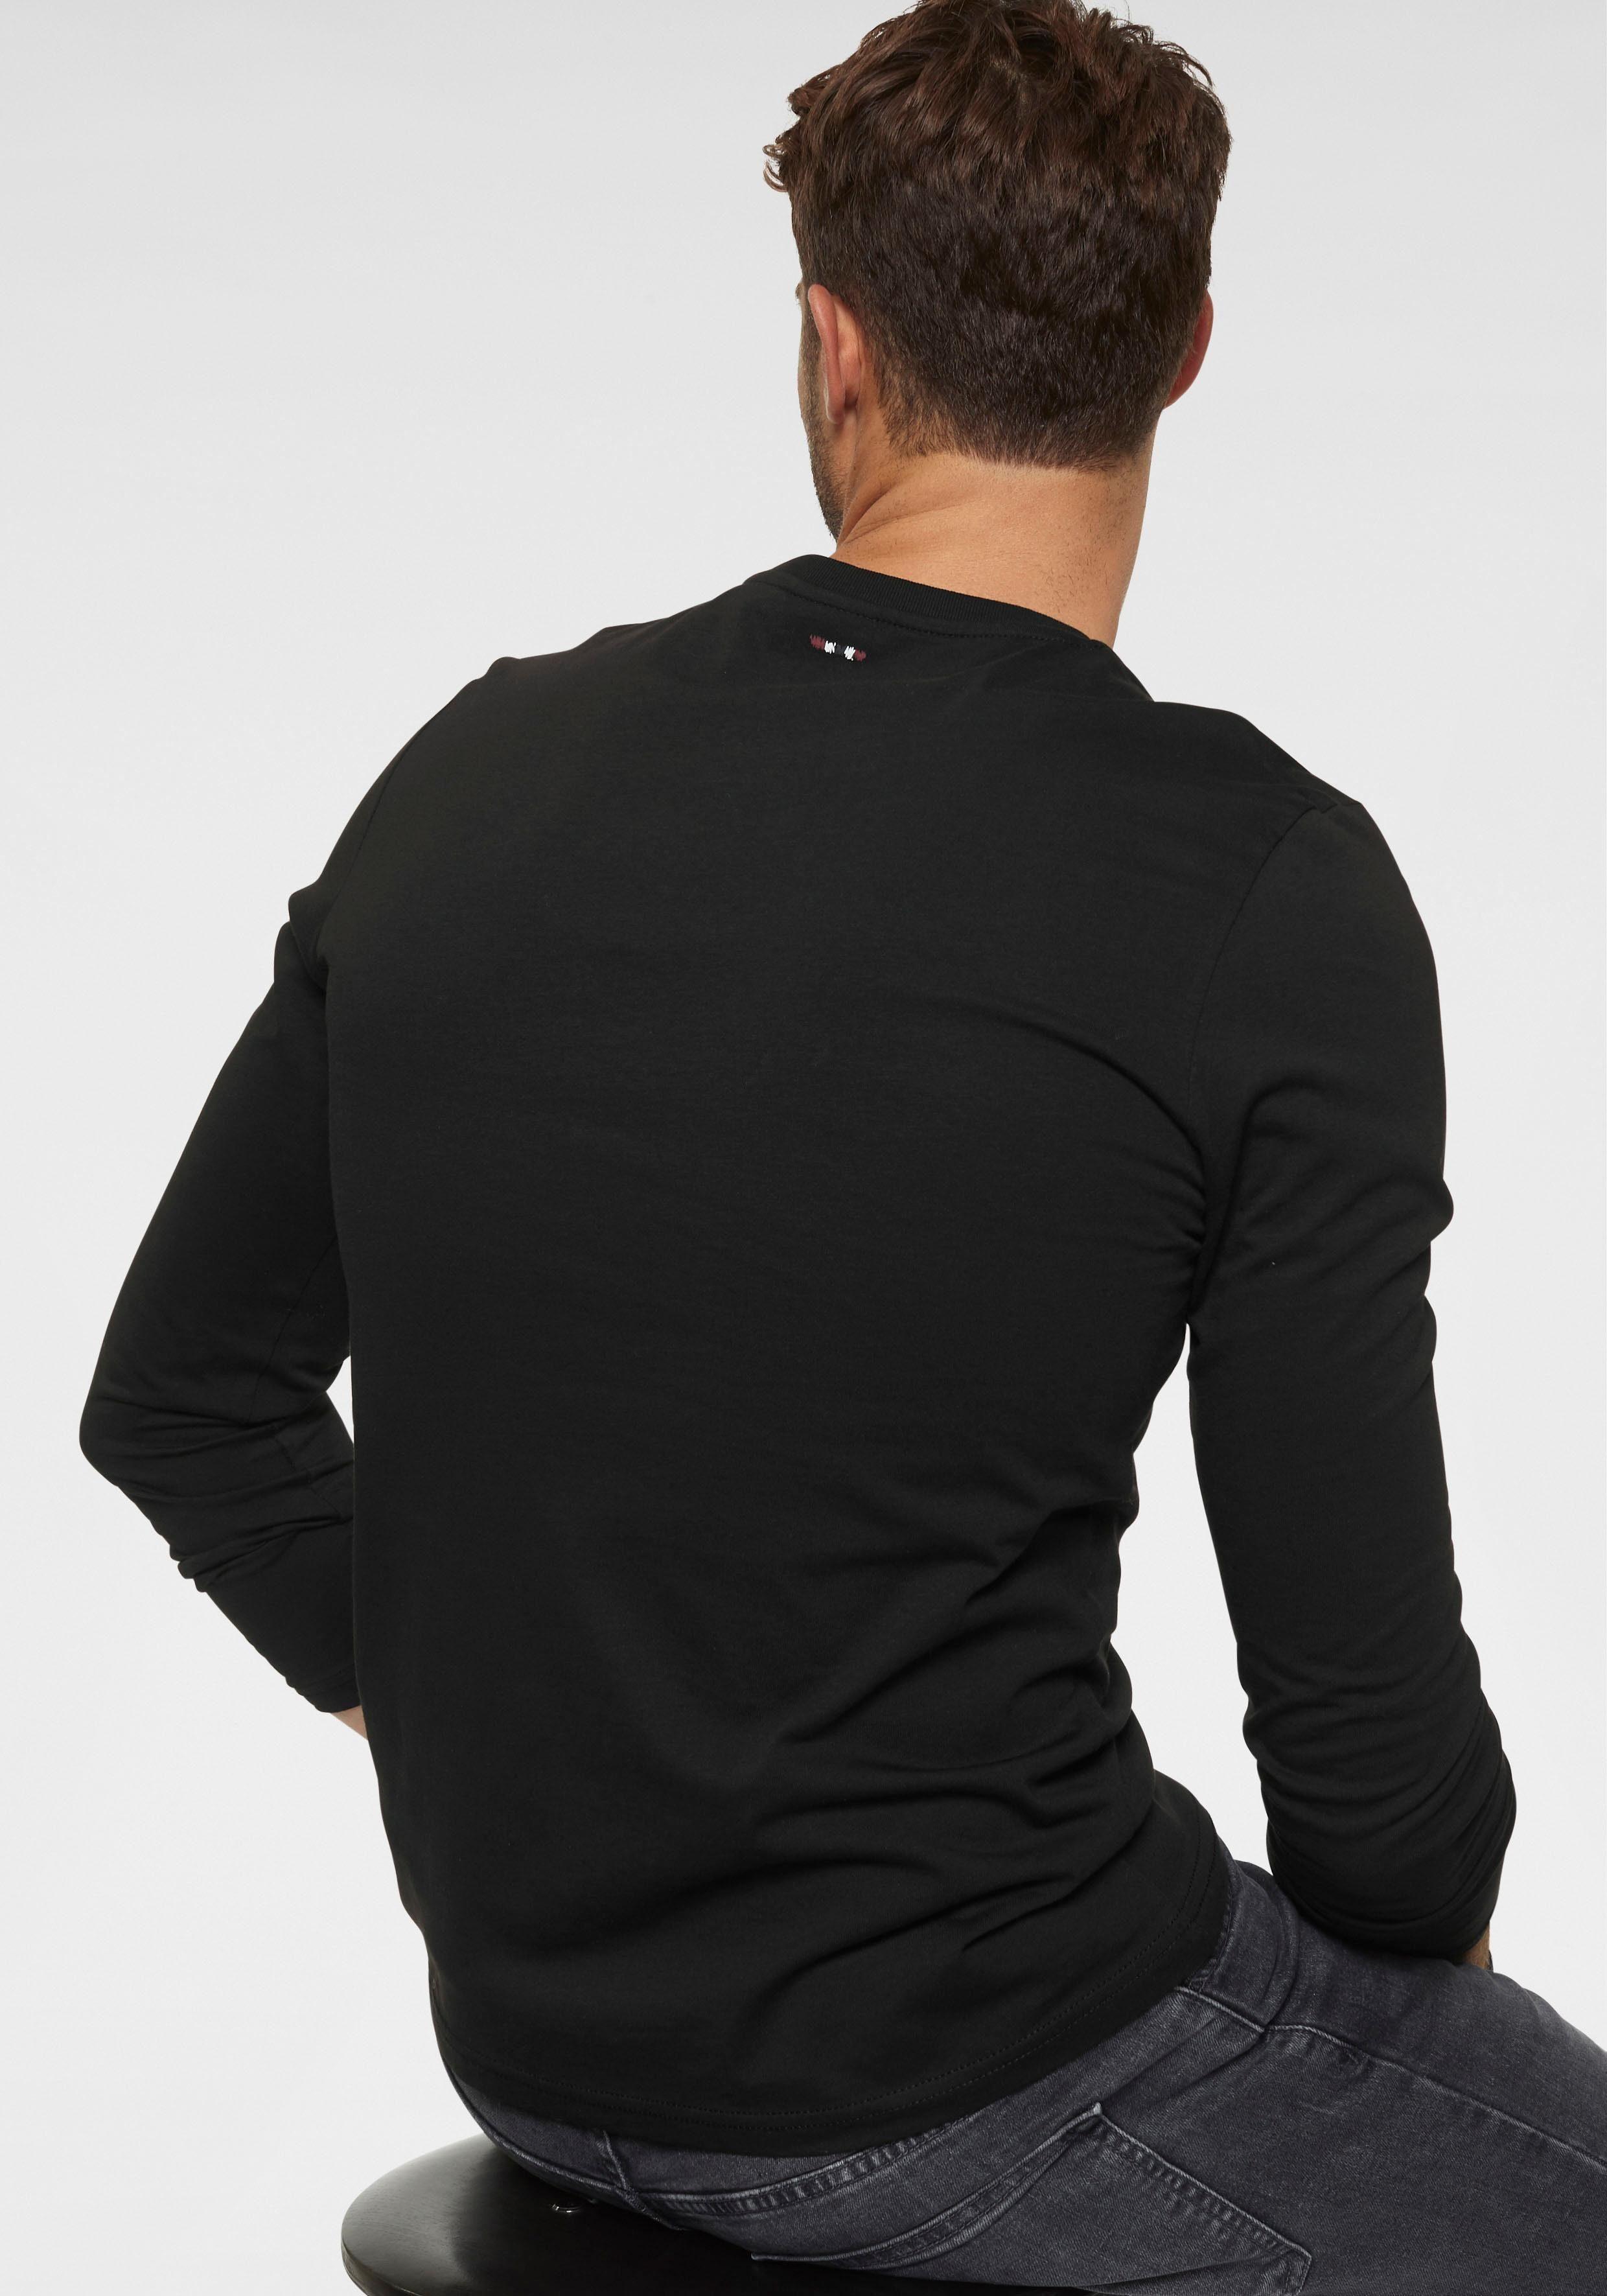 Napapijri Online Langarmshirt Napapijri Online Langarmshirt Kaufen wk80nPOX